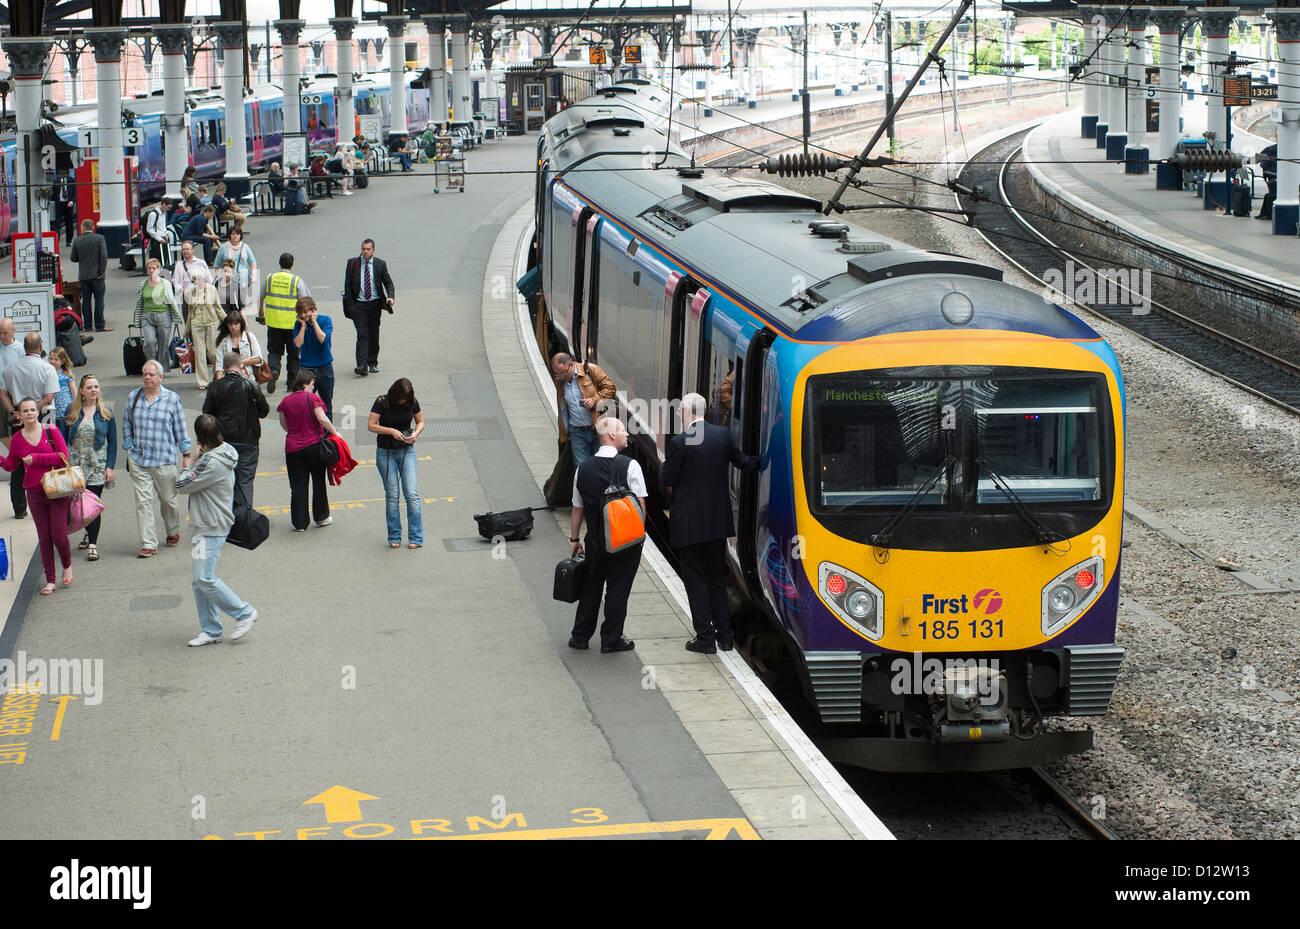 First Transpennine Express Class 185 passenger train waiting at a platform at York Railway Station, England. - Stock Image